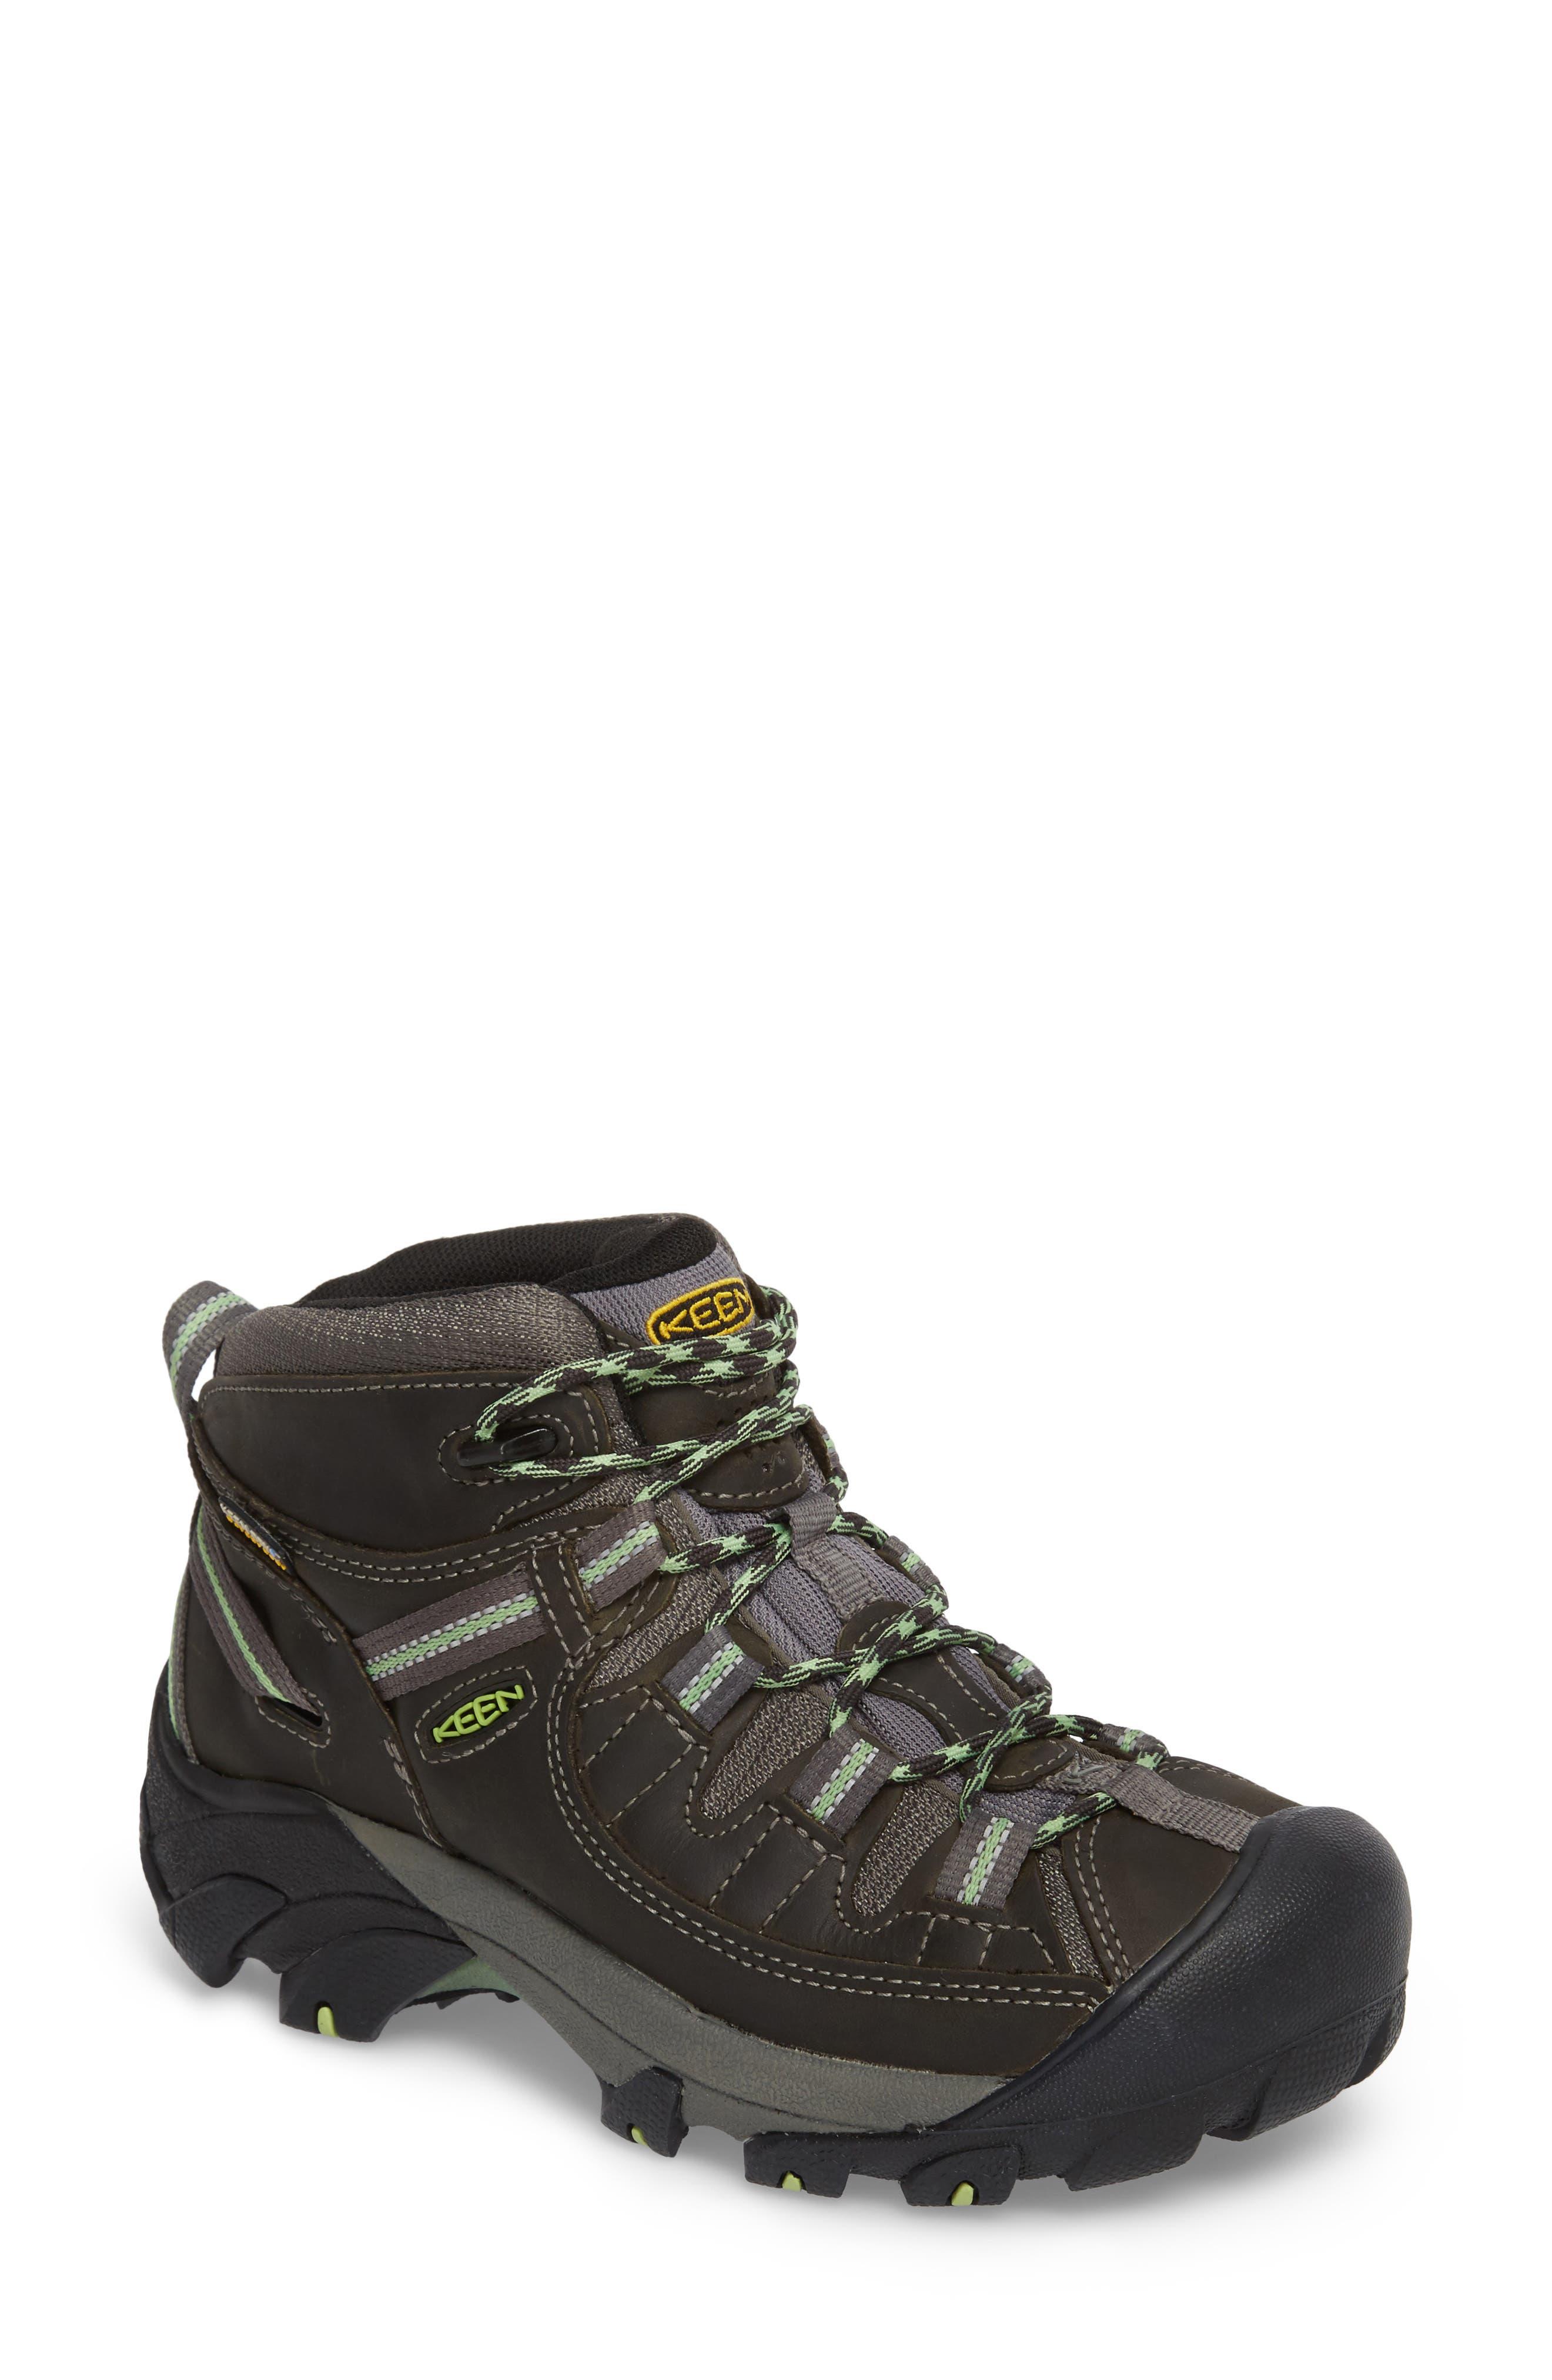 KEEN, Targhee II Mid Waterproof Hiking Boot, Main thumbnail 1, color, RAVEN/ OPALINE